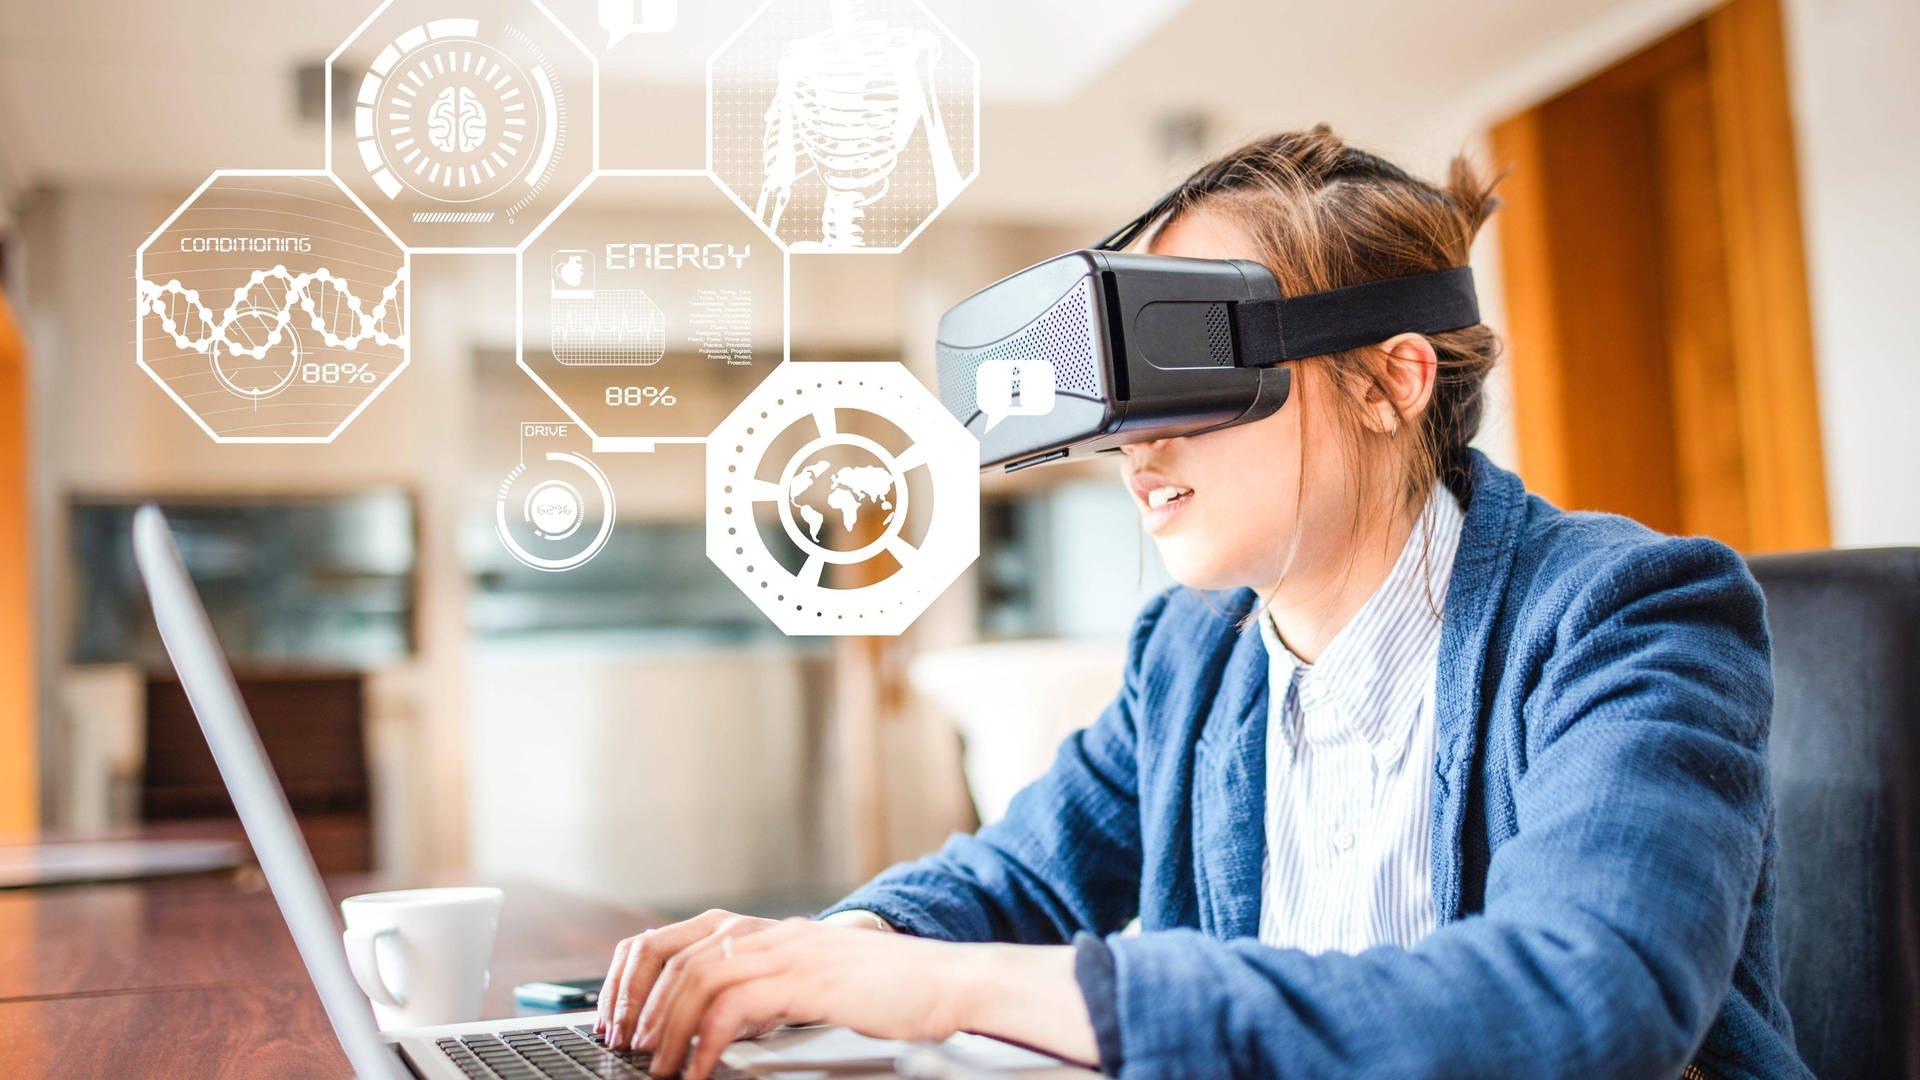 Die digitale Hochschule – Wie viel E-Learning darf es sein? - SWR2